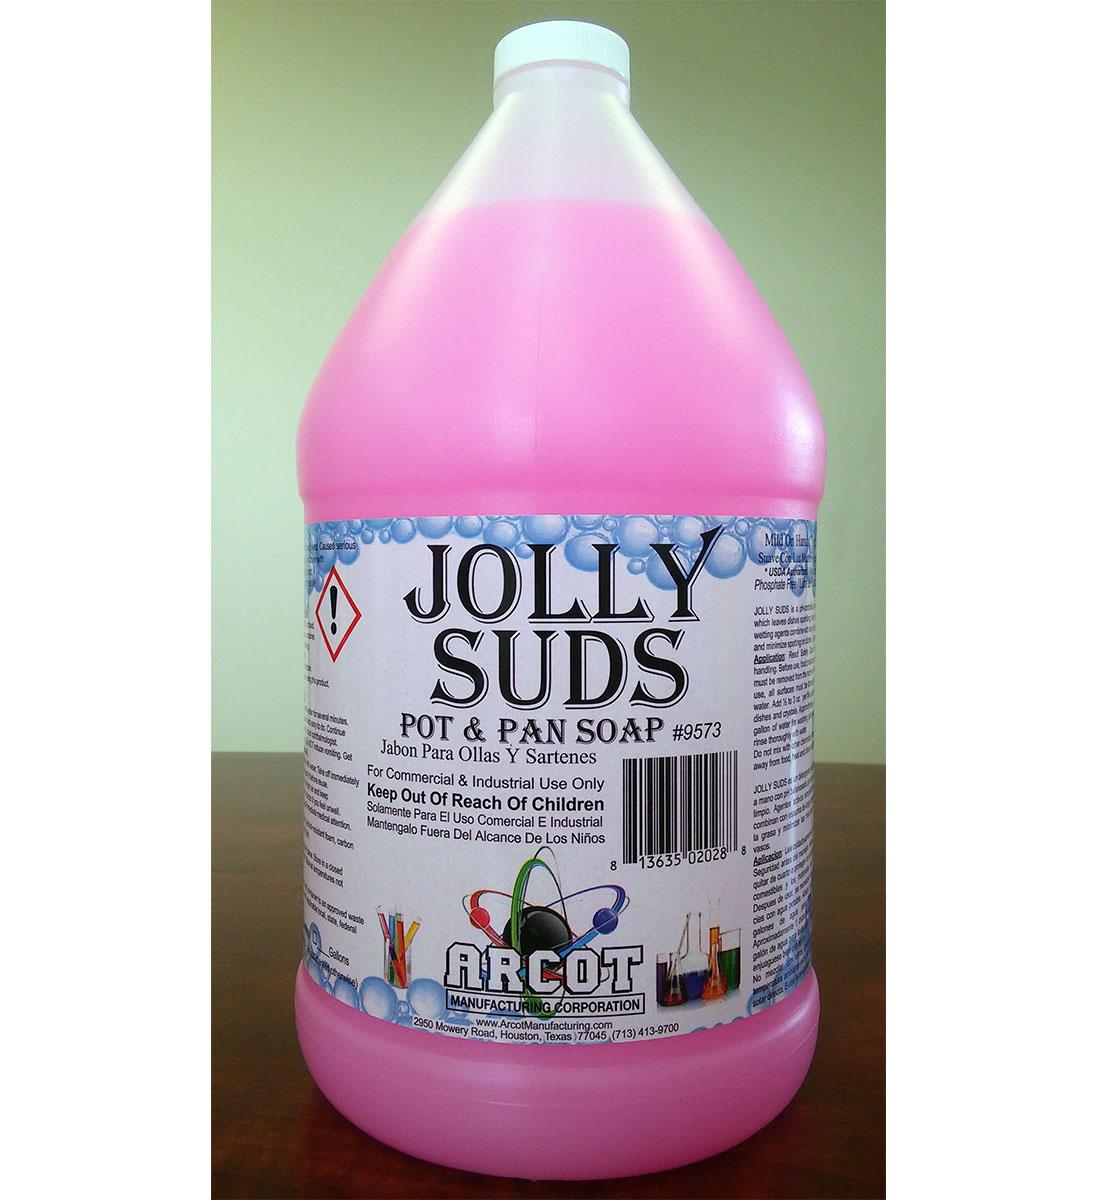 Jolly Suds 1